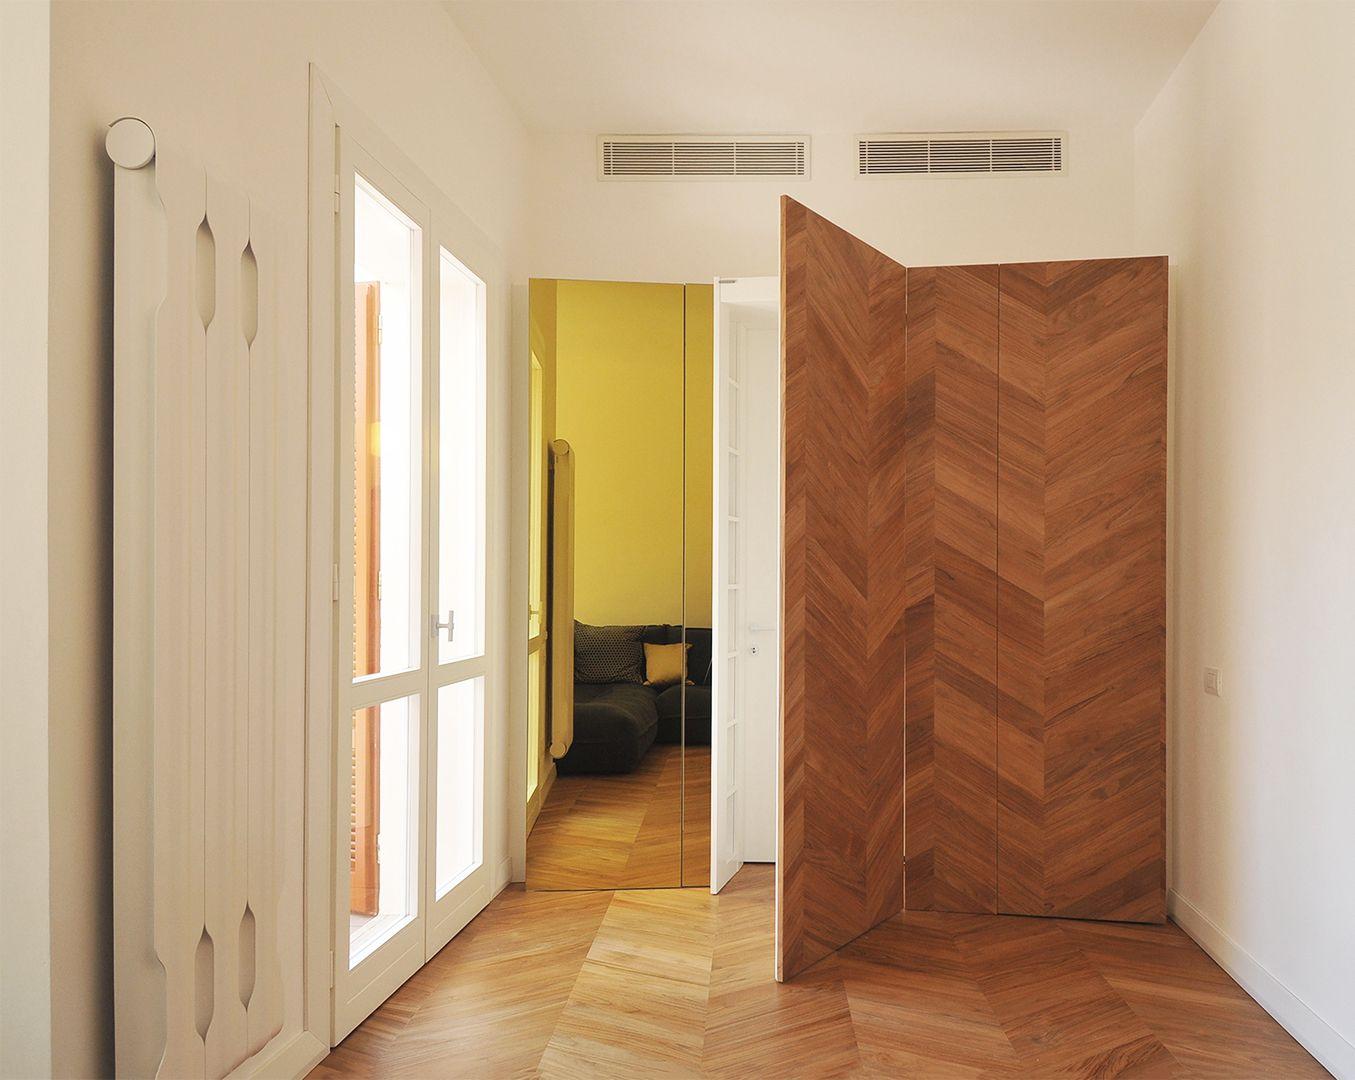 #tissellistudio secret white doors behind wooden closets